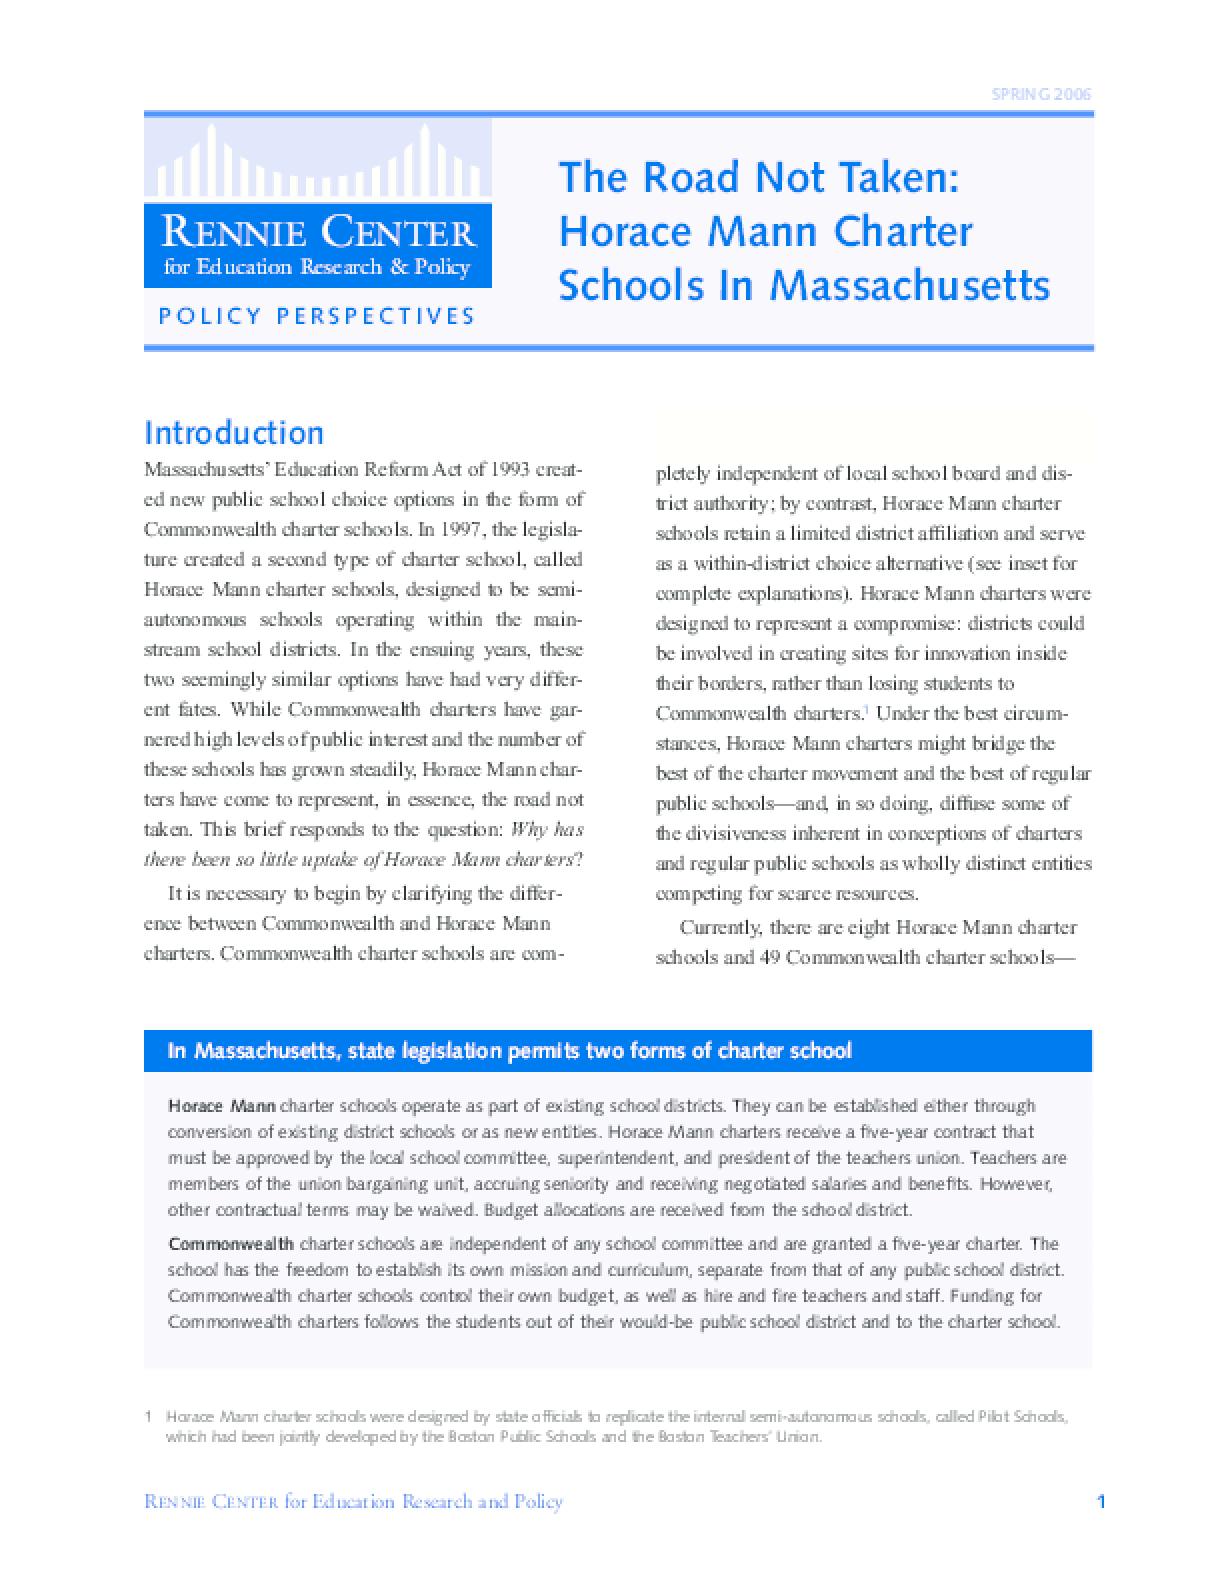 The Road Not Taken: Horace Mann Charter Schools in Massachusetts